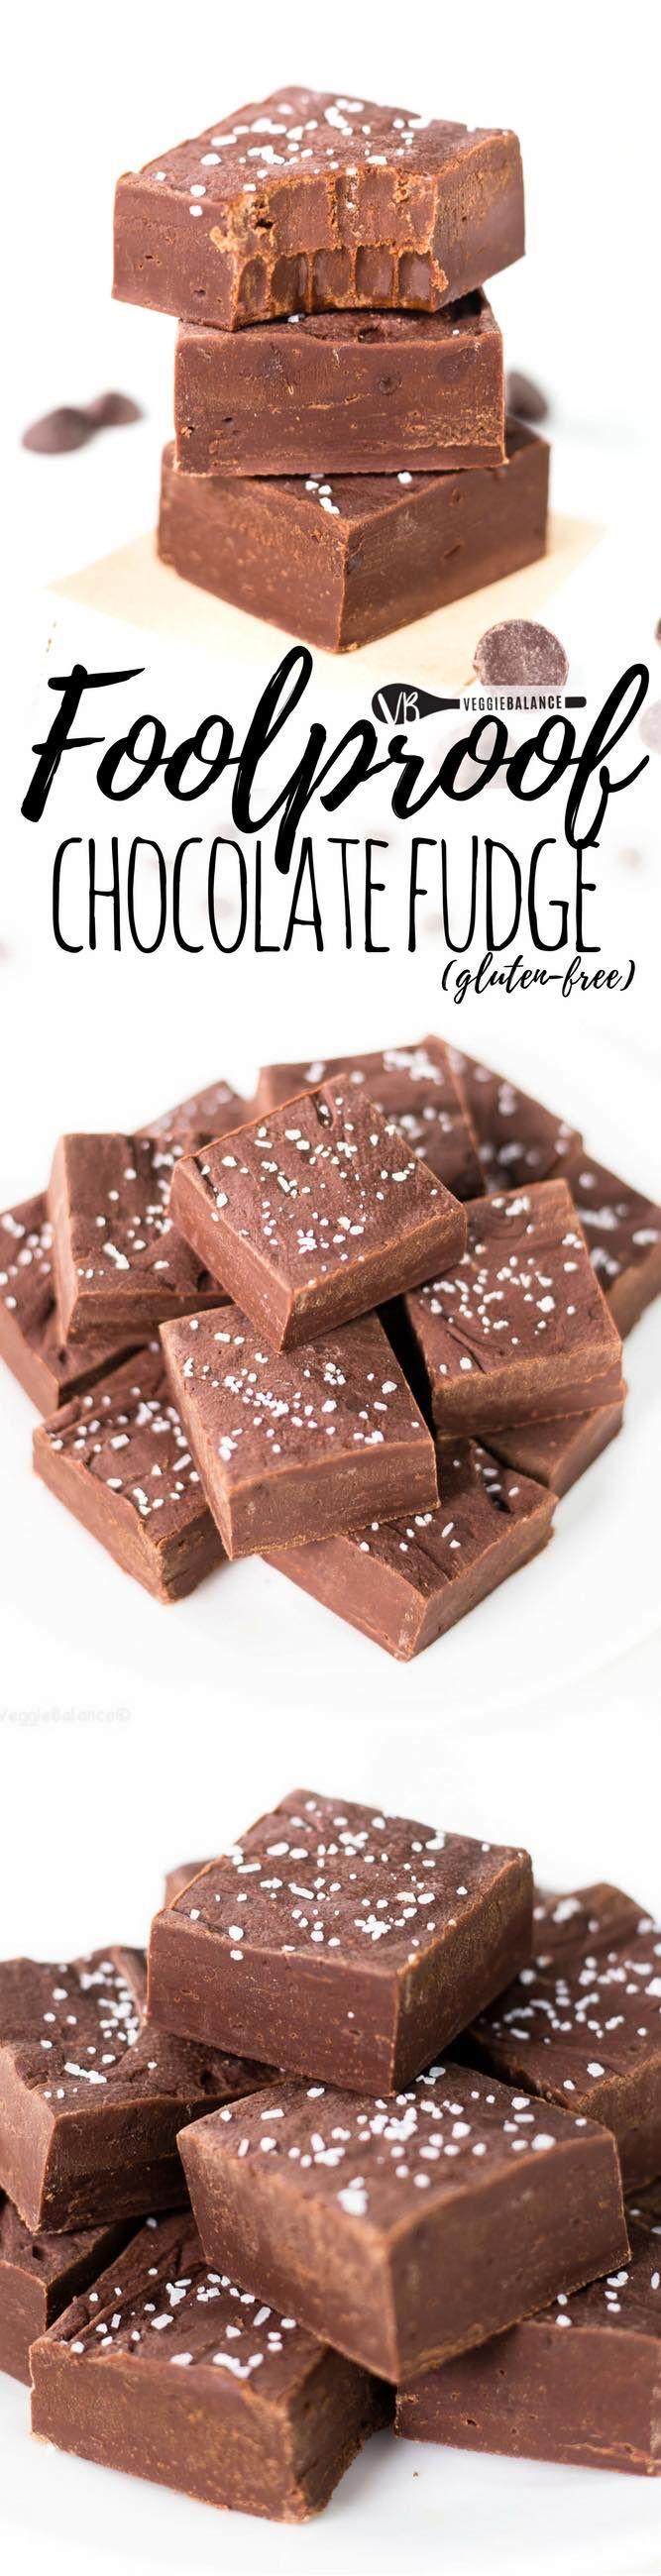 Easy Chocolate Fudge Veggie Balance This Recipe Is Foolproof